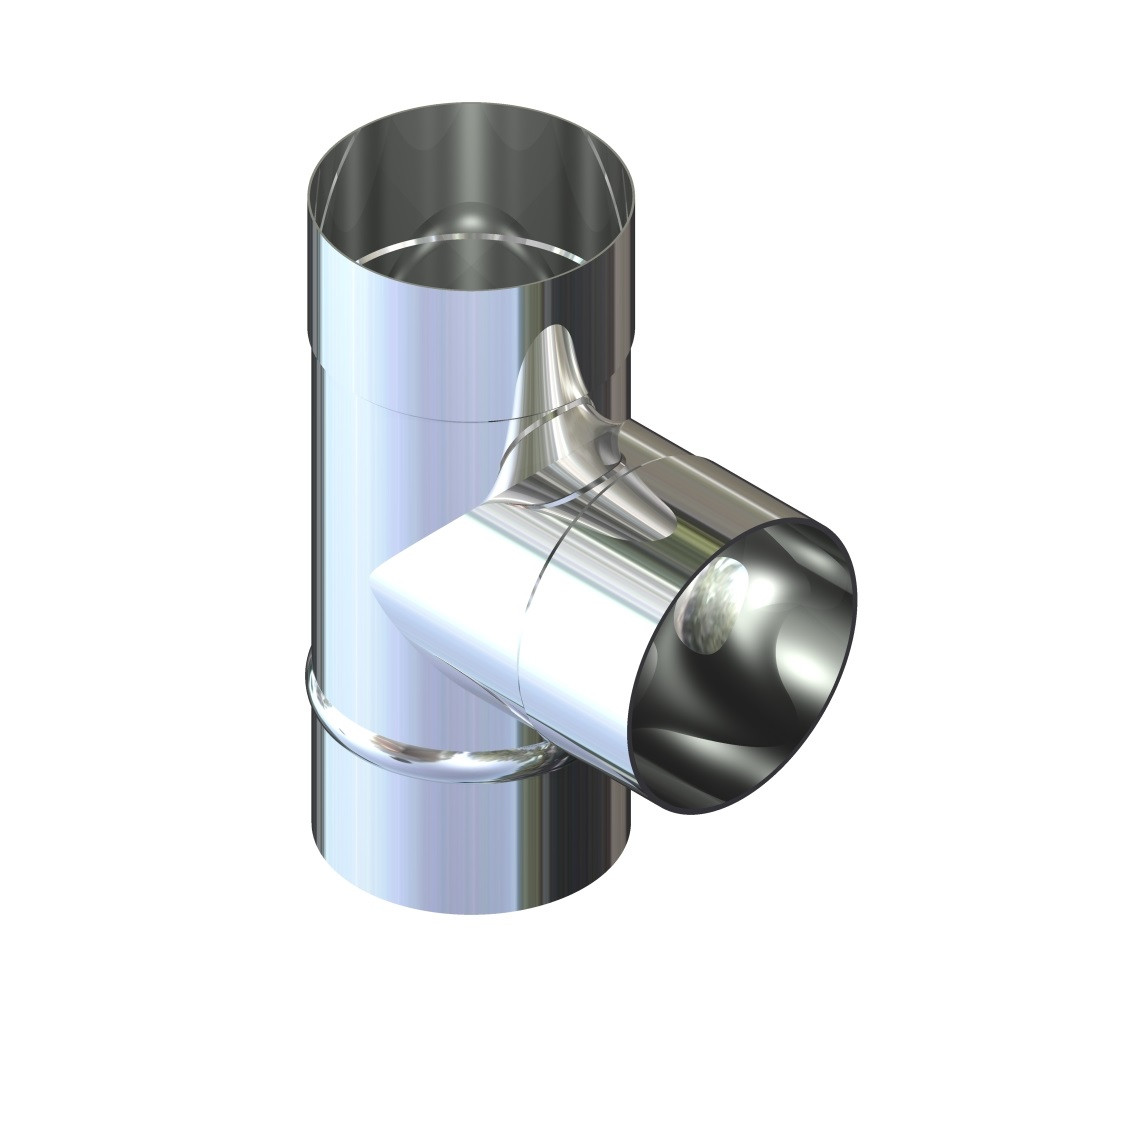 Тройник 87° для дымохода D-160 мм толщина 0,6 мм